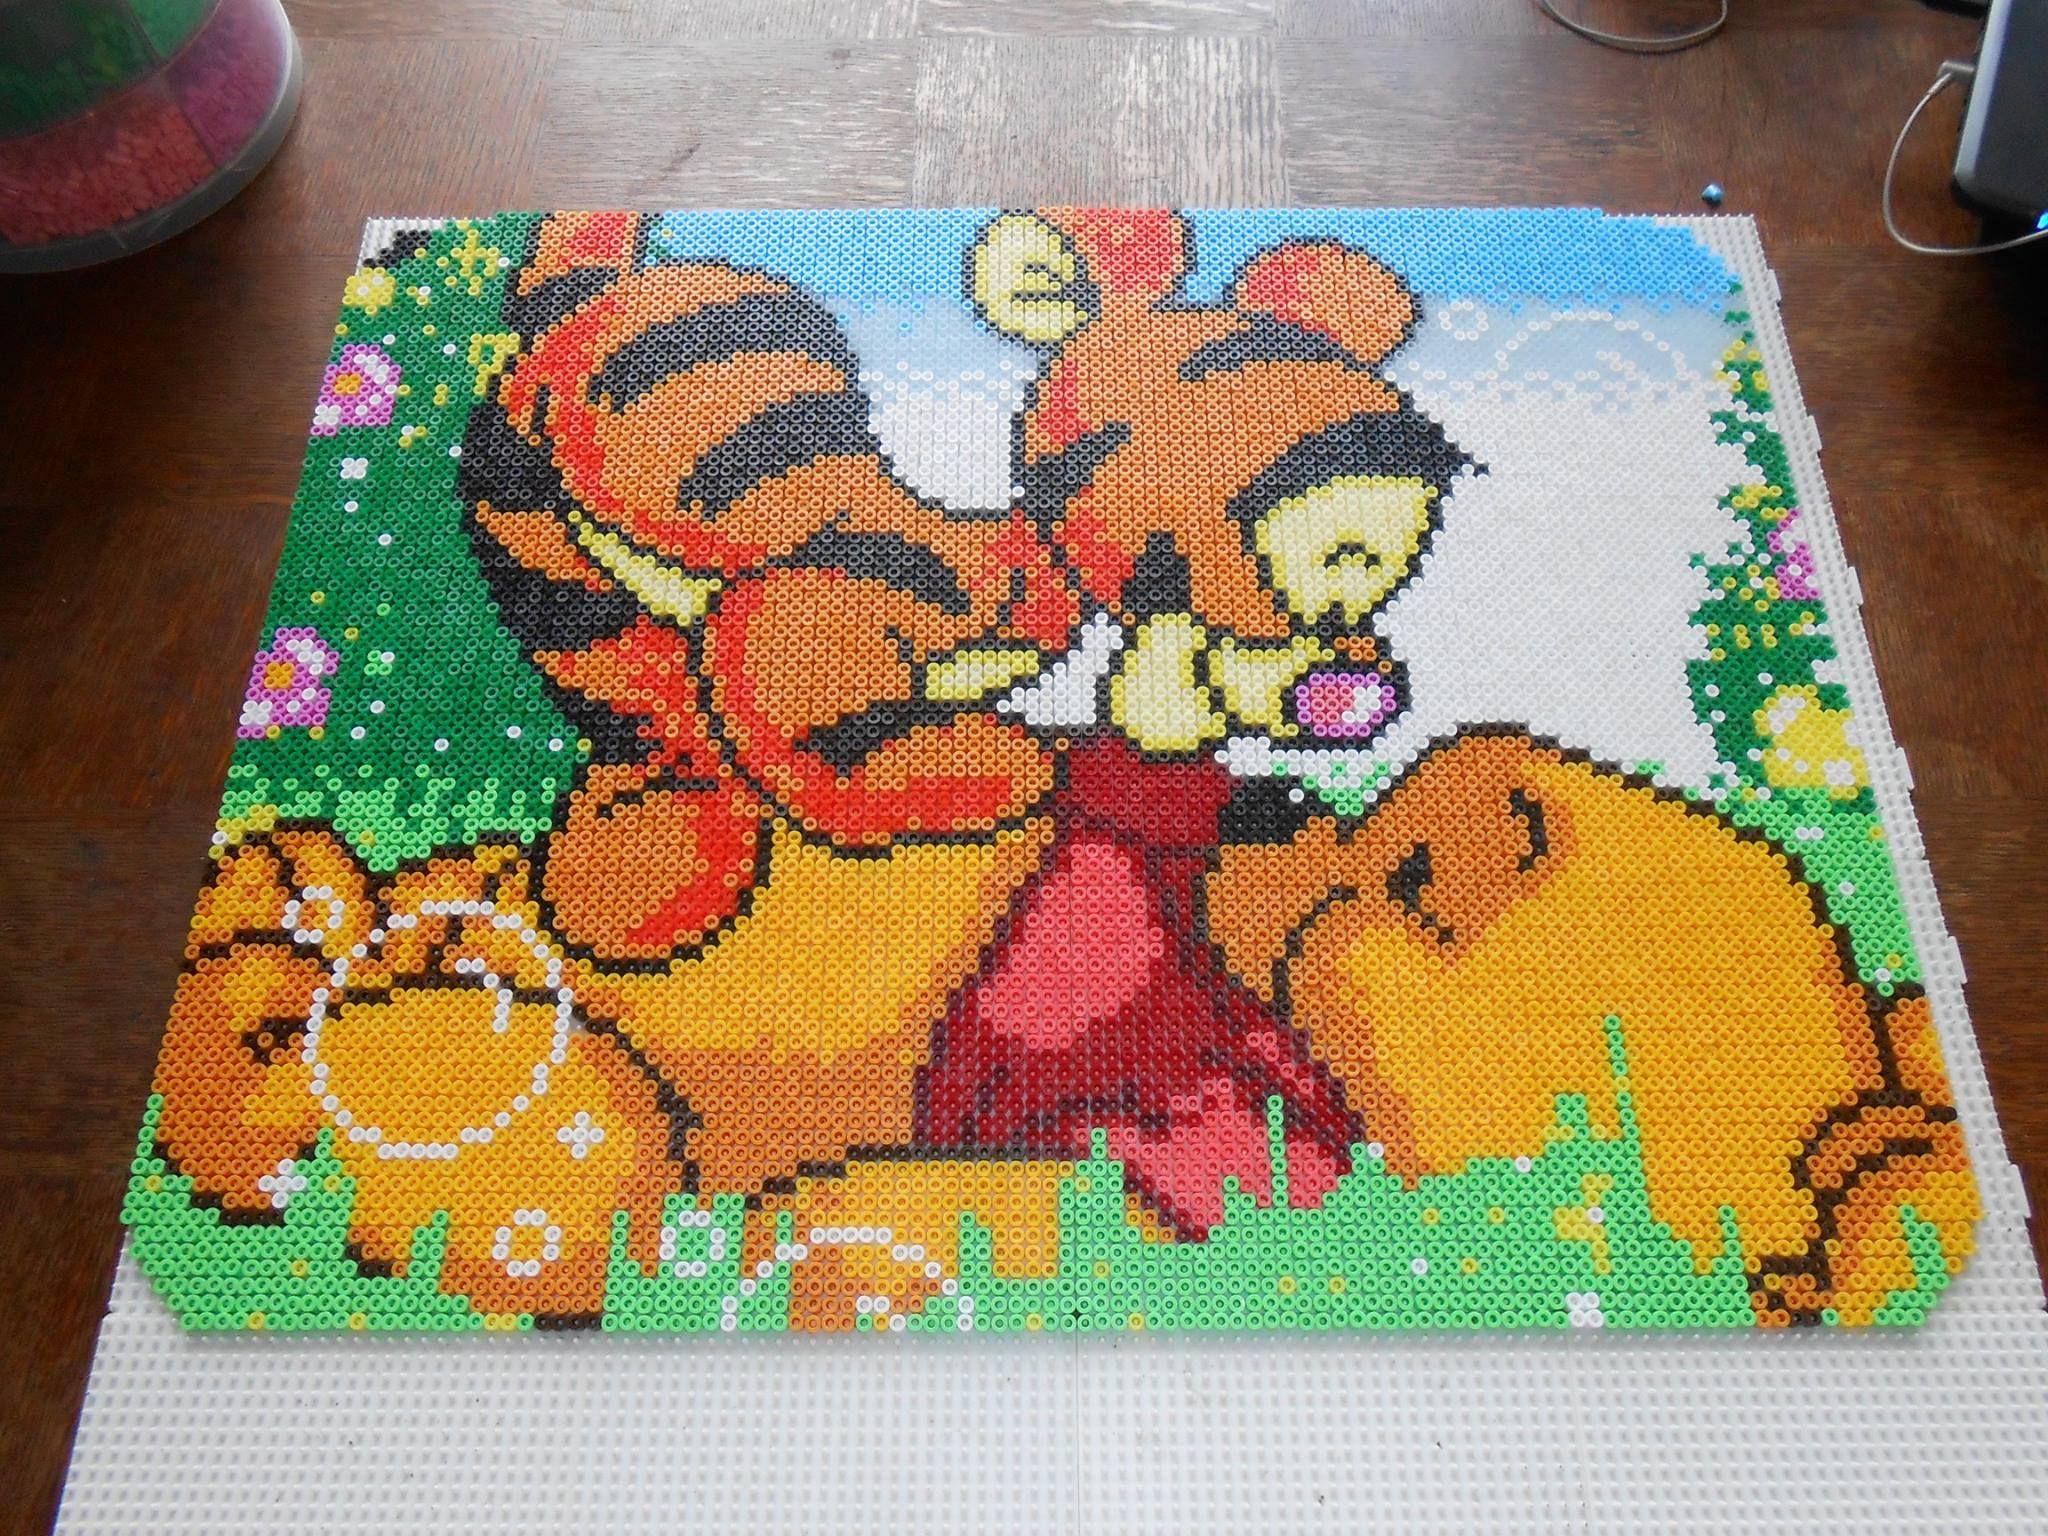 Baby Tigger and Baby Winnie hama perler beads (16 pegboards) by swarovski